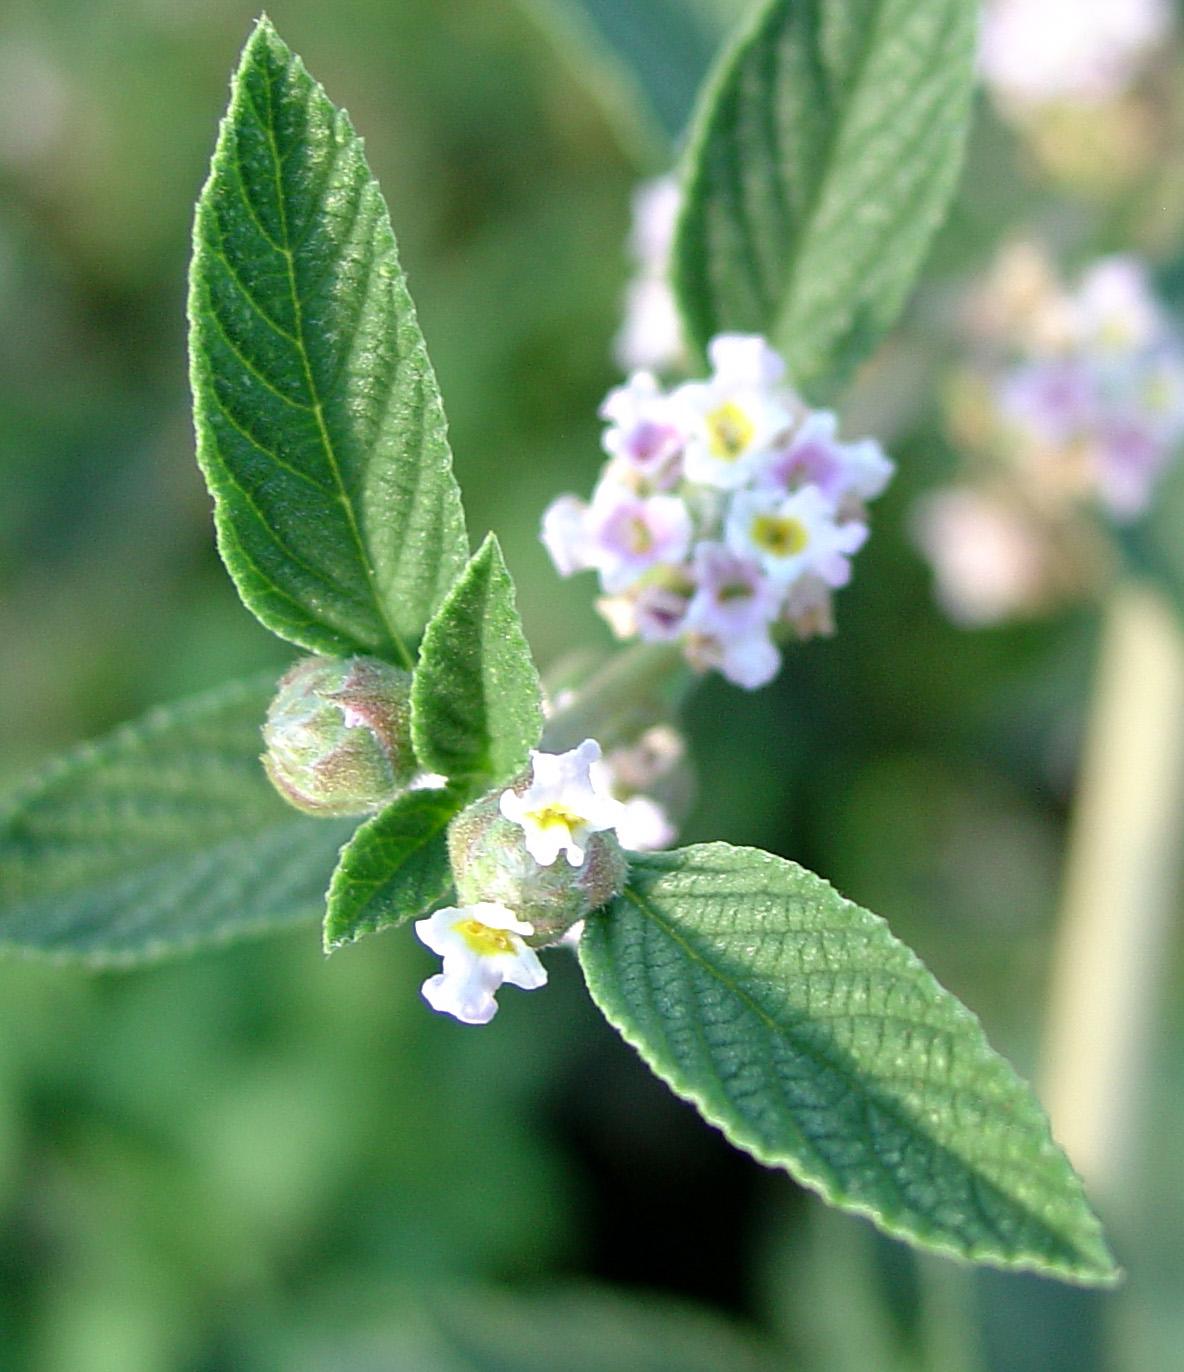 Medicinal Plants at Pura Vida Spa & Yoga Retreat: Lemon ...